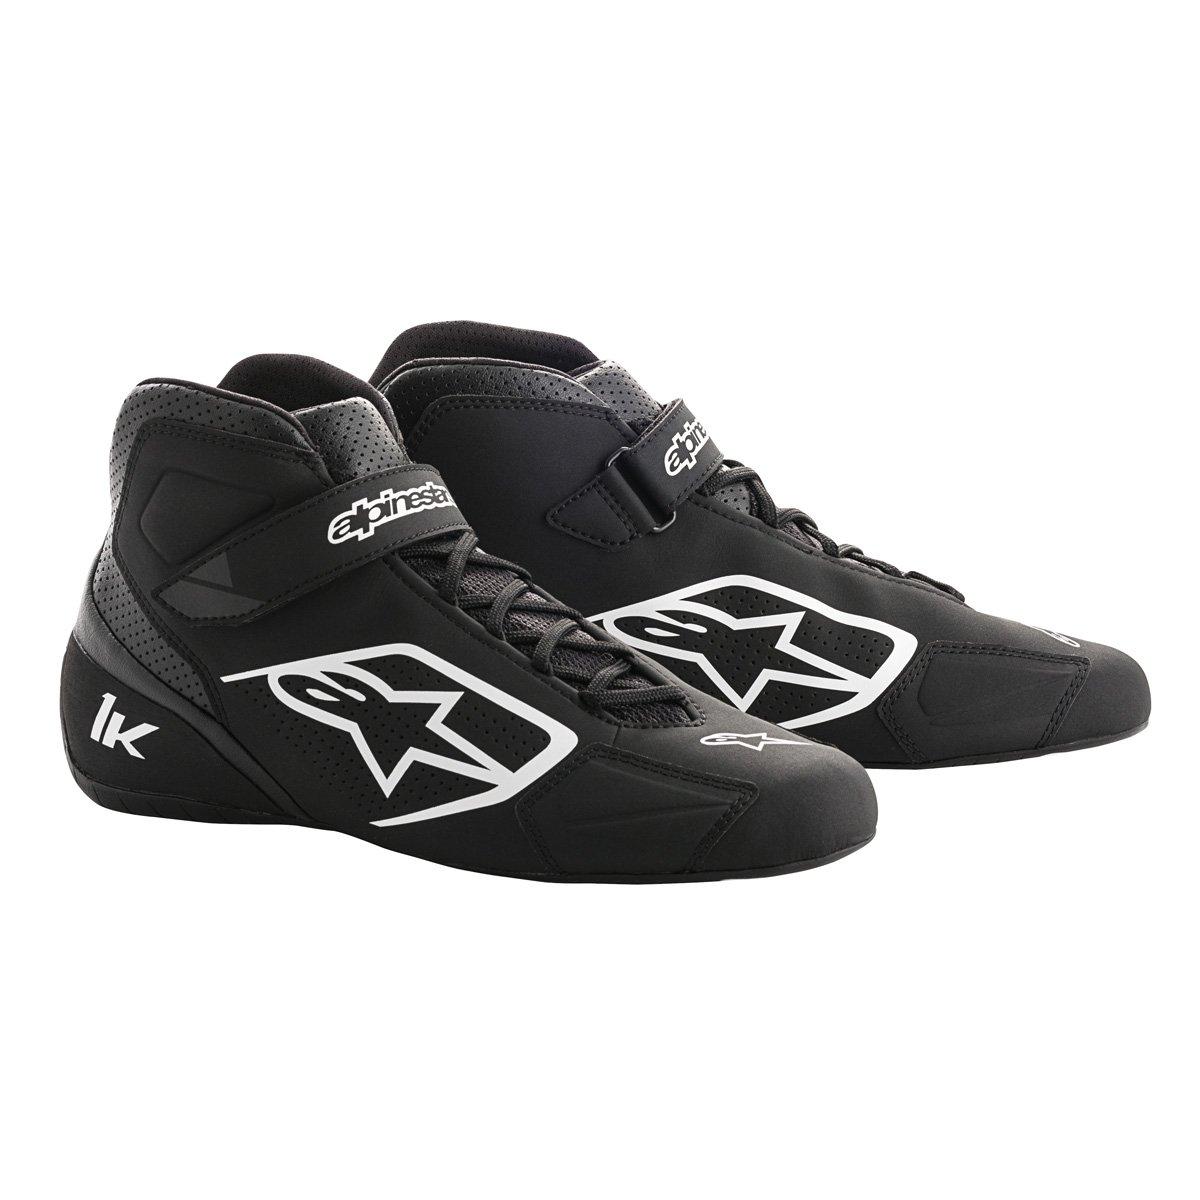 Alpinestars 2712018-12B-10 Tech 1-K Shoes, Black/White, Size 10 by Alpinestars